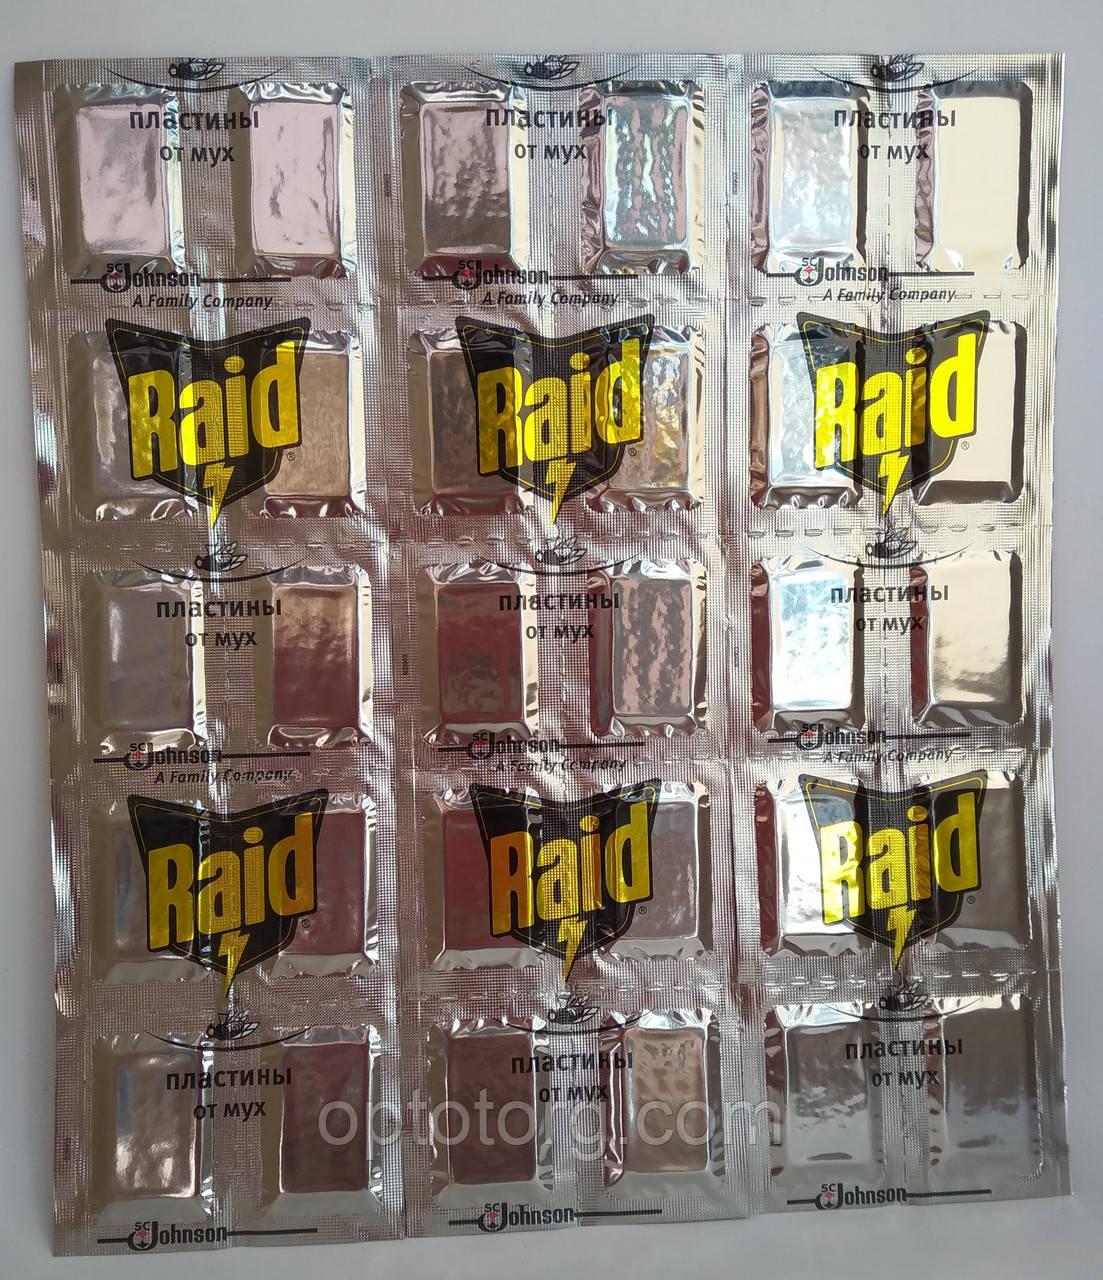 Рейд пластины от мух оригинал 10 штук